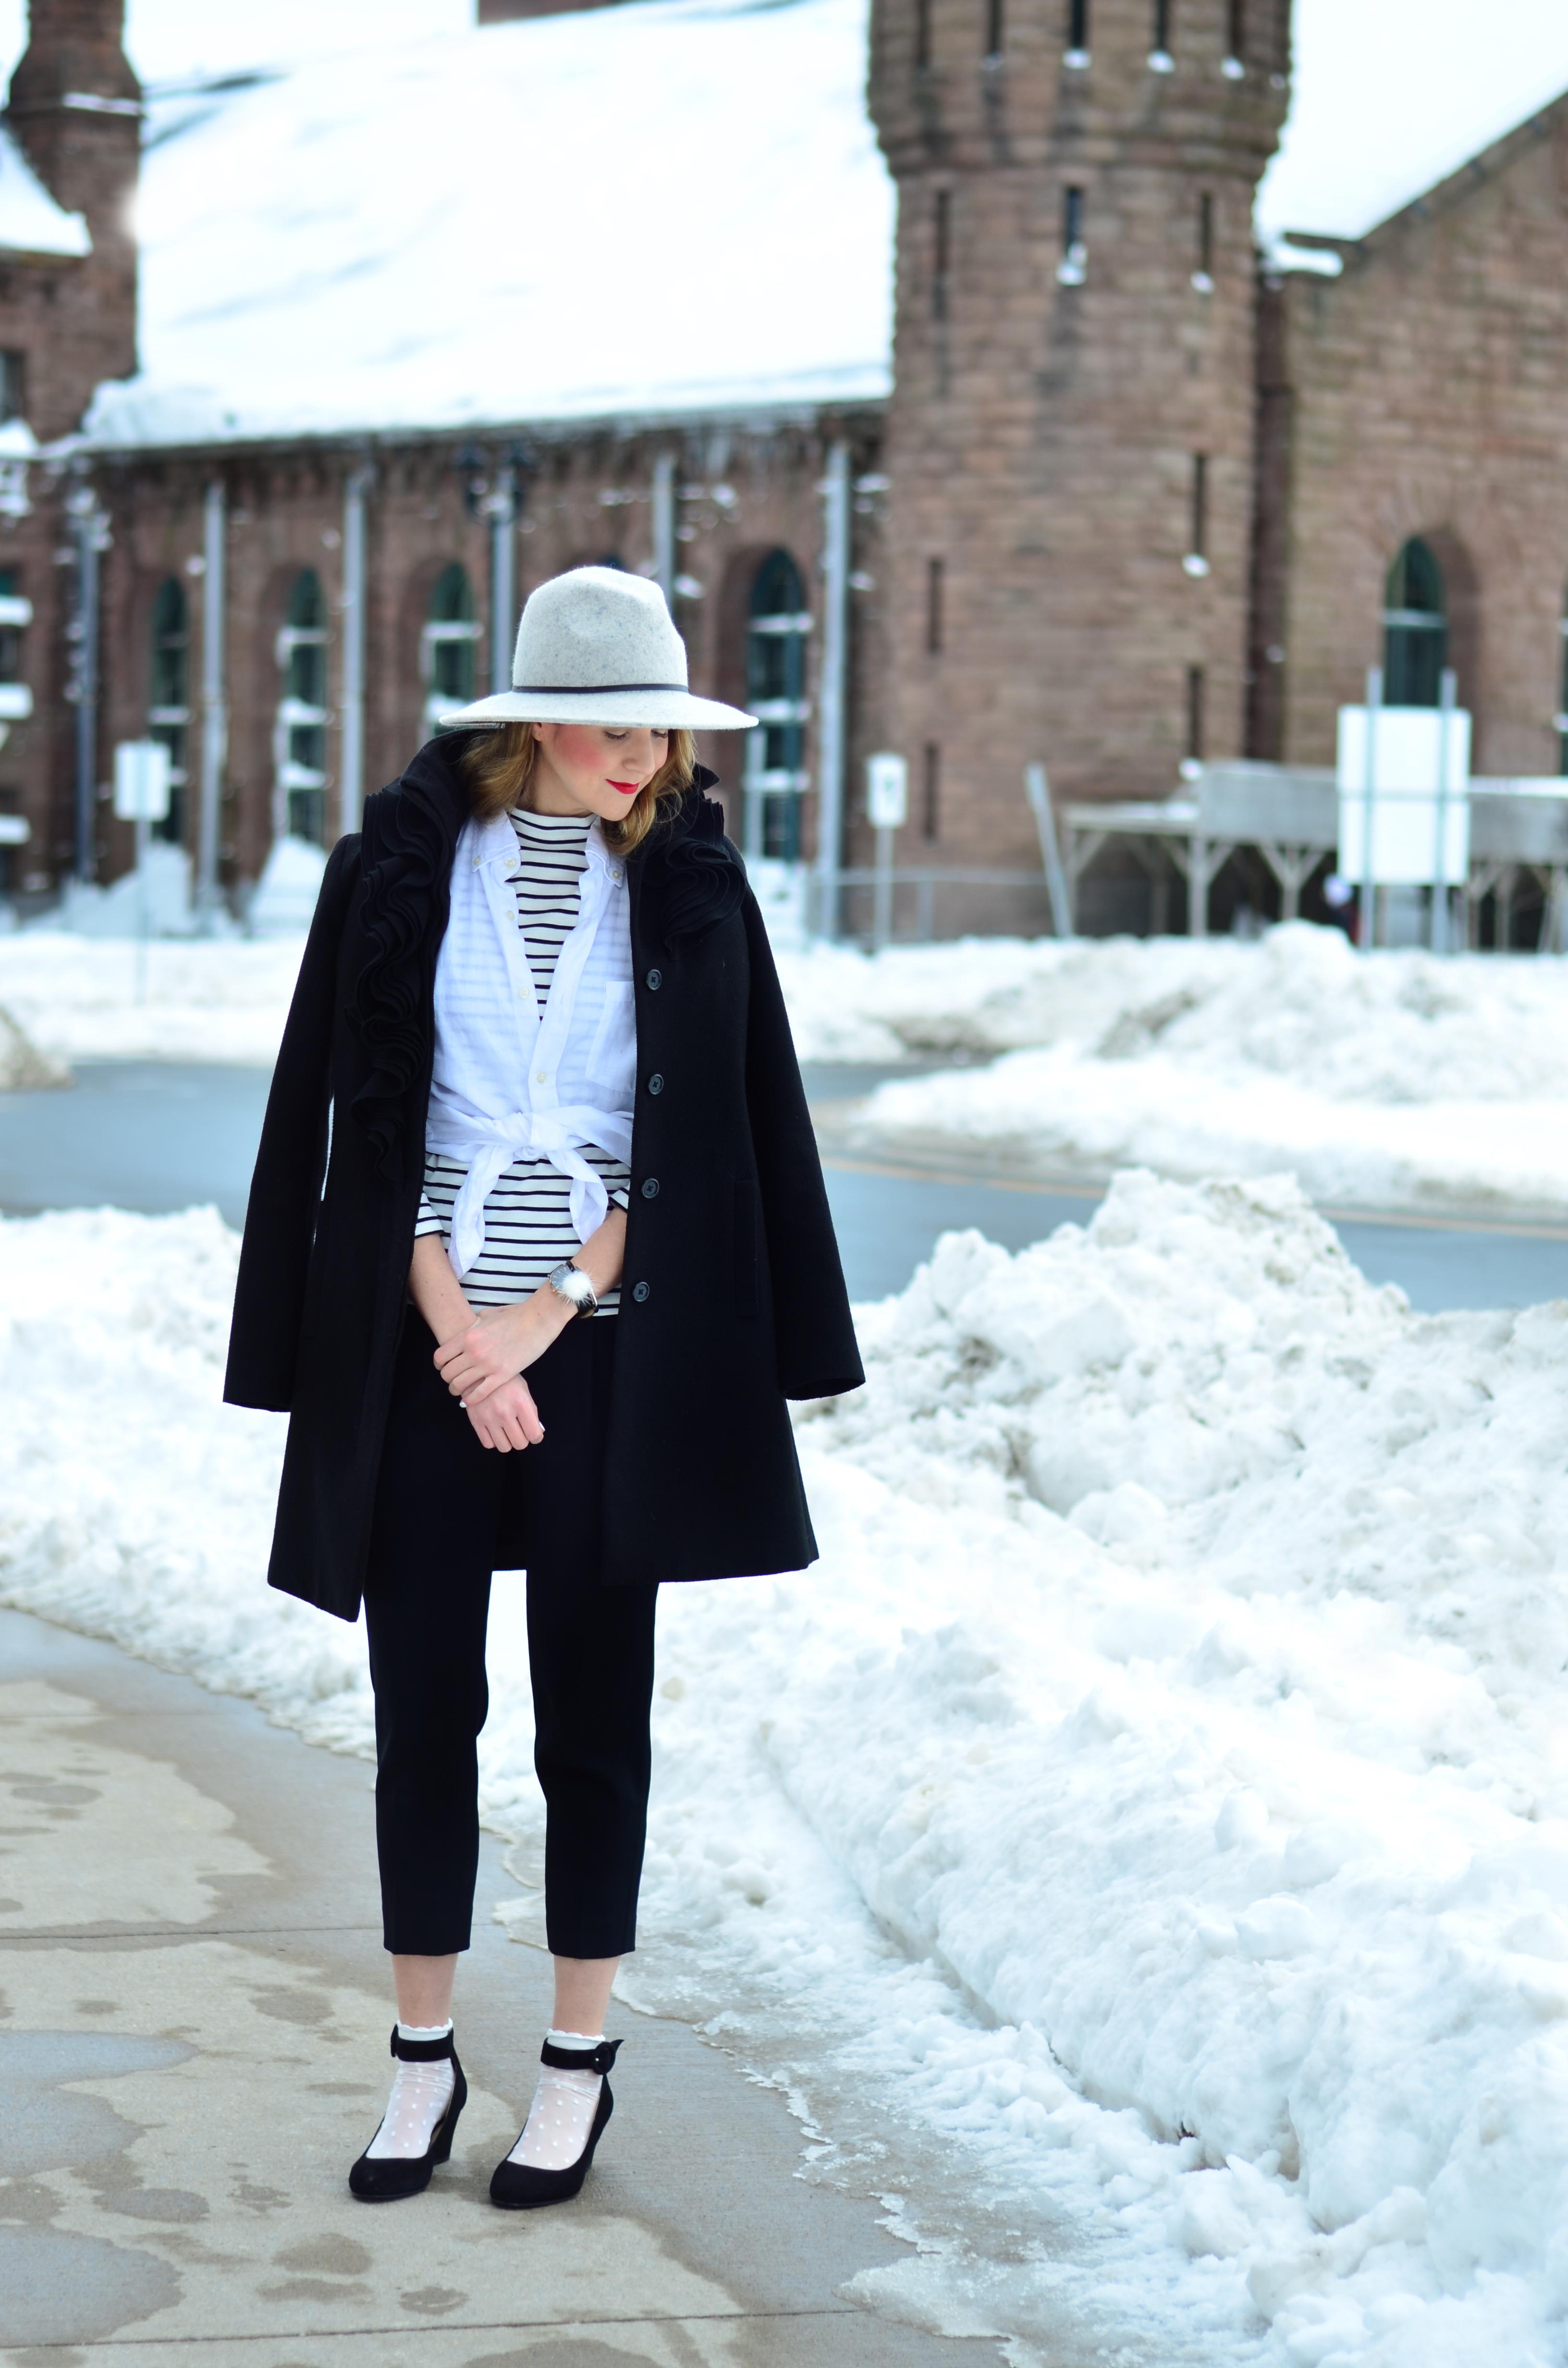 Mens button down, Trouser Socks, Spring Trends 2017, Fishnets, Halifax Blogger, Style Blogger, Full Time Fashion Blogger, East Coast Blogs, Best Blogger